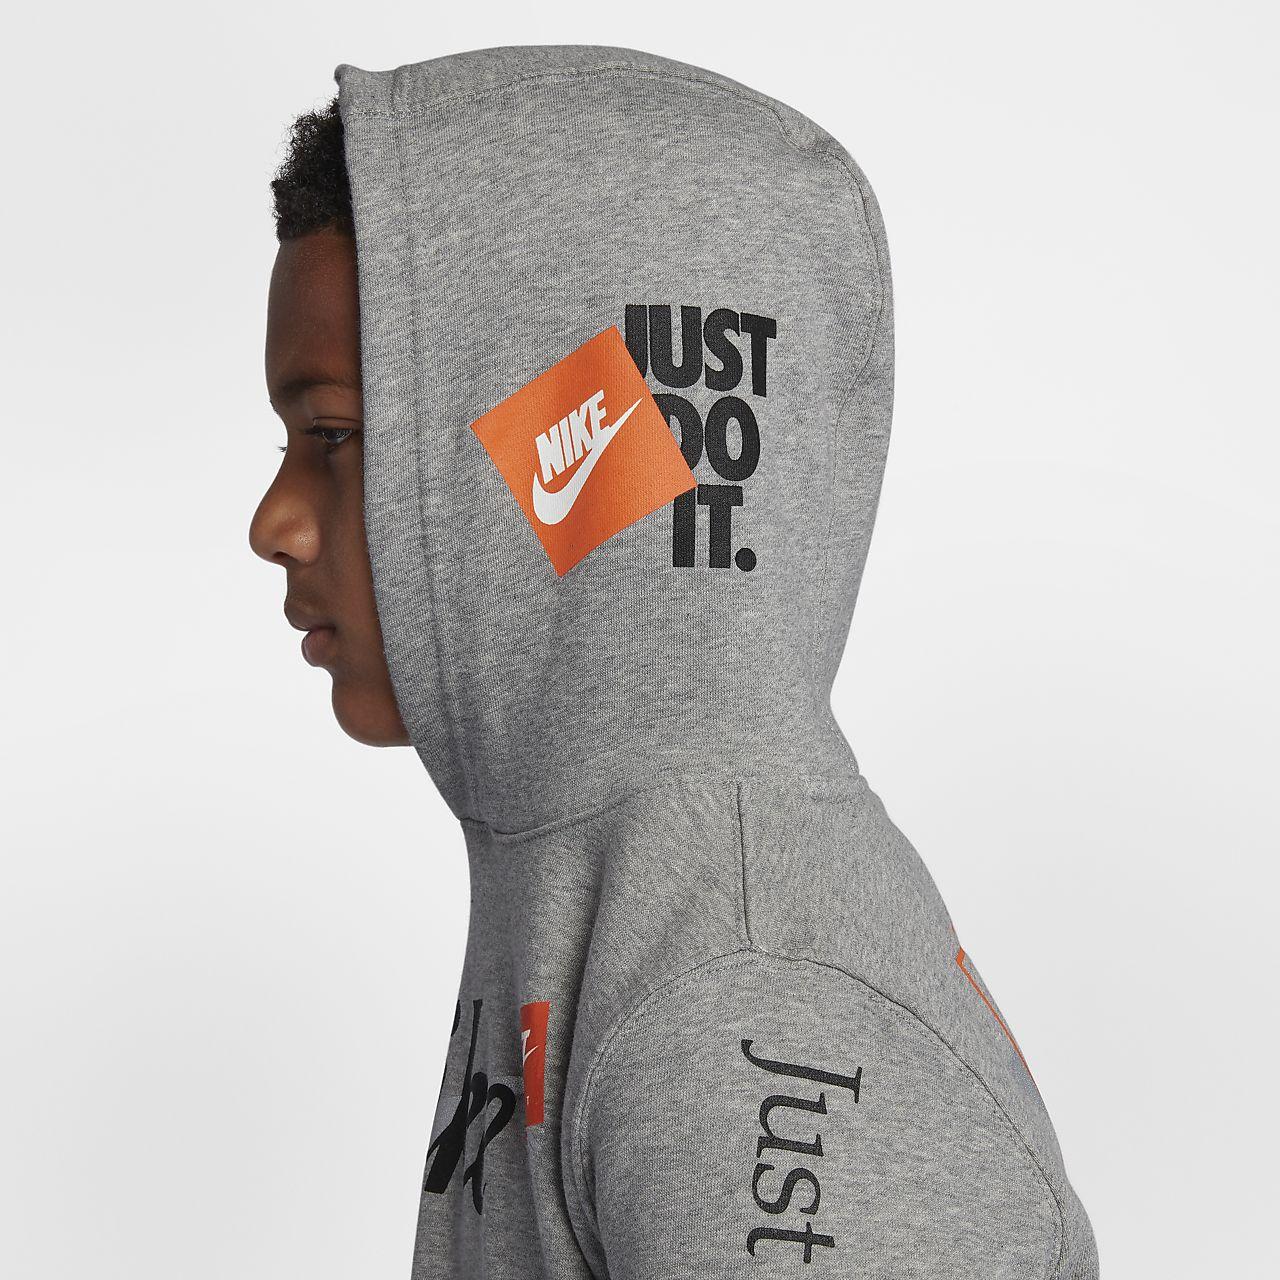 e52c2dd156eecc Nike Sportswear Big Kids  (Boys ) Just Do It Pullover Hoodie. Nike.com